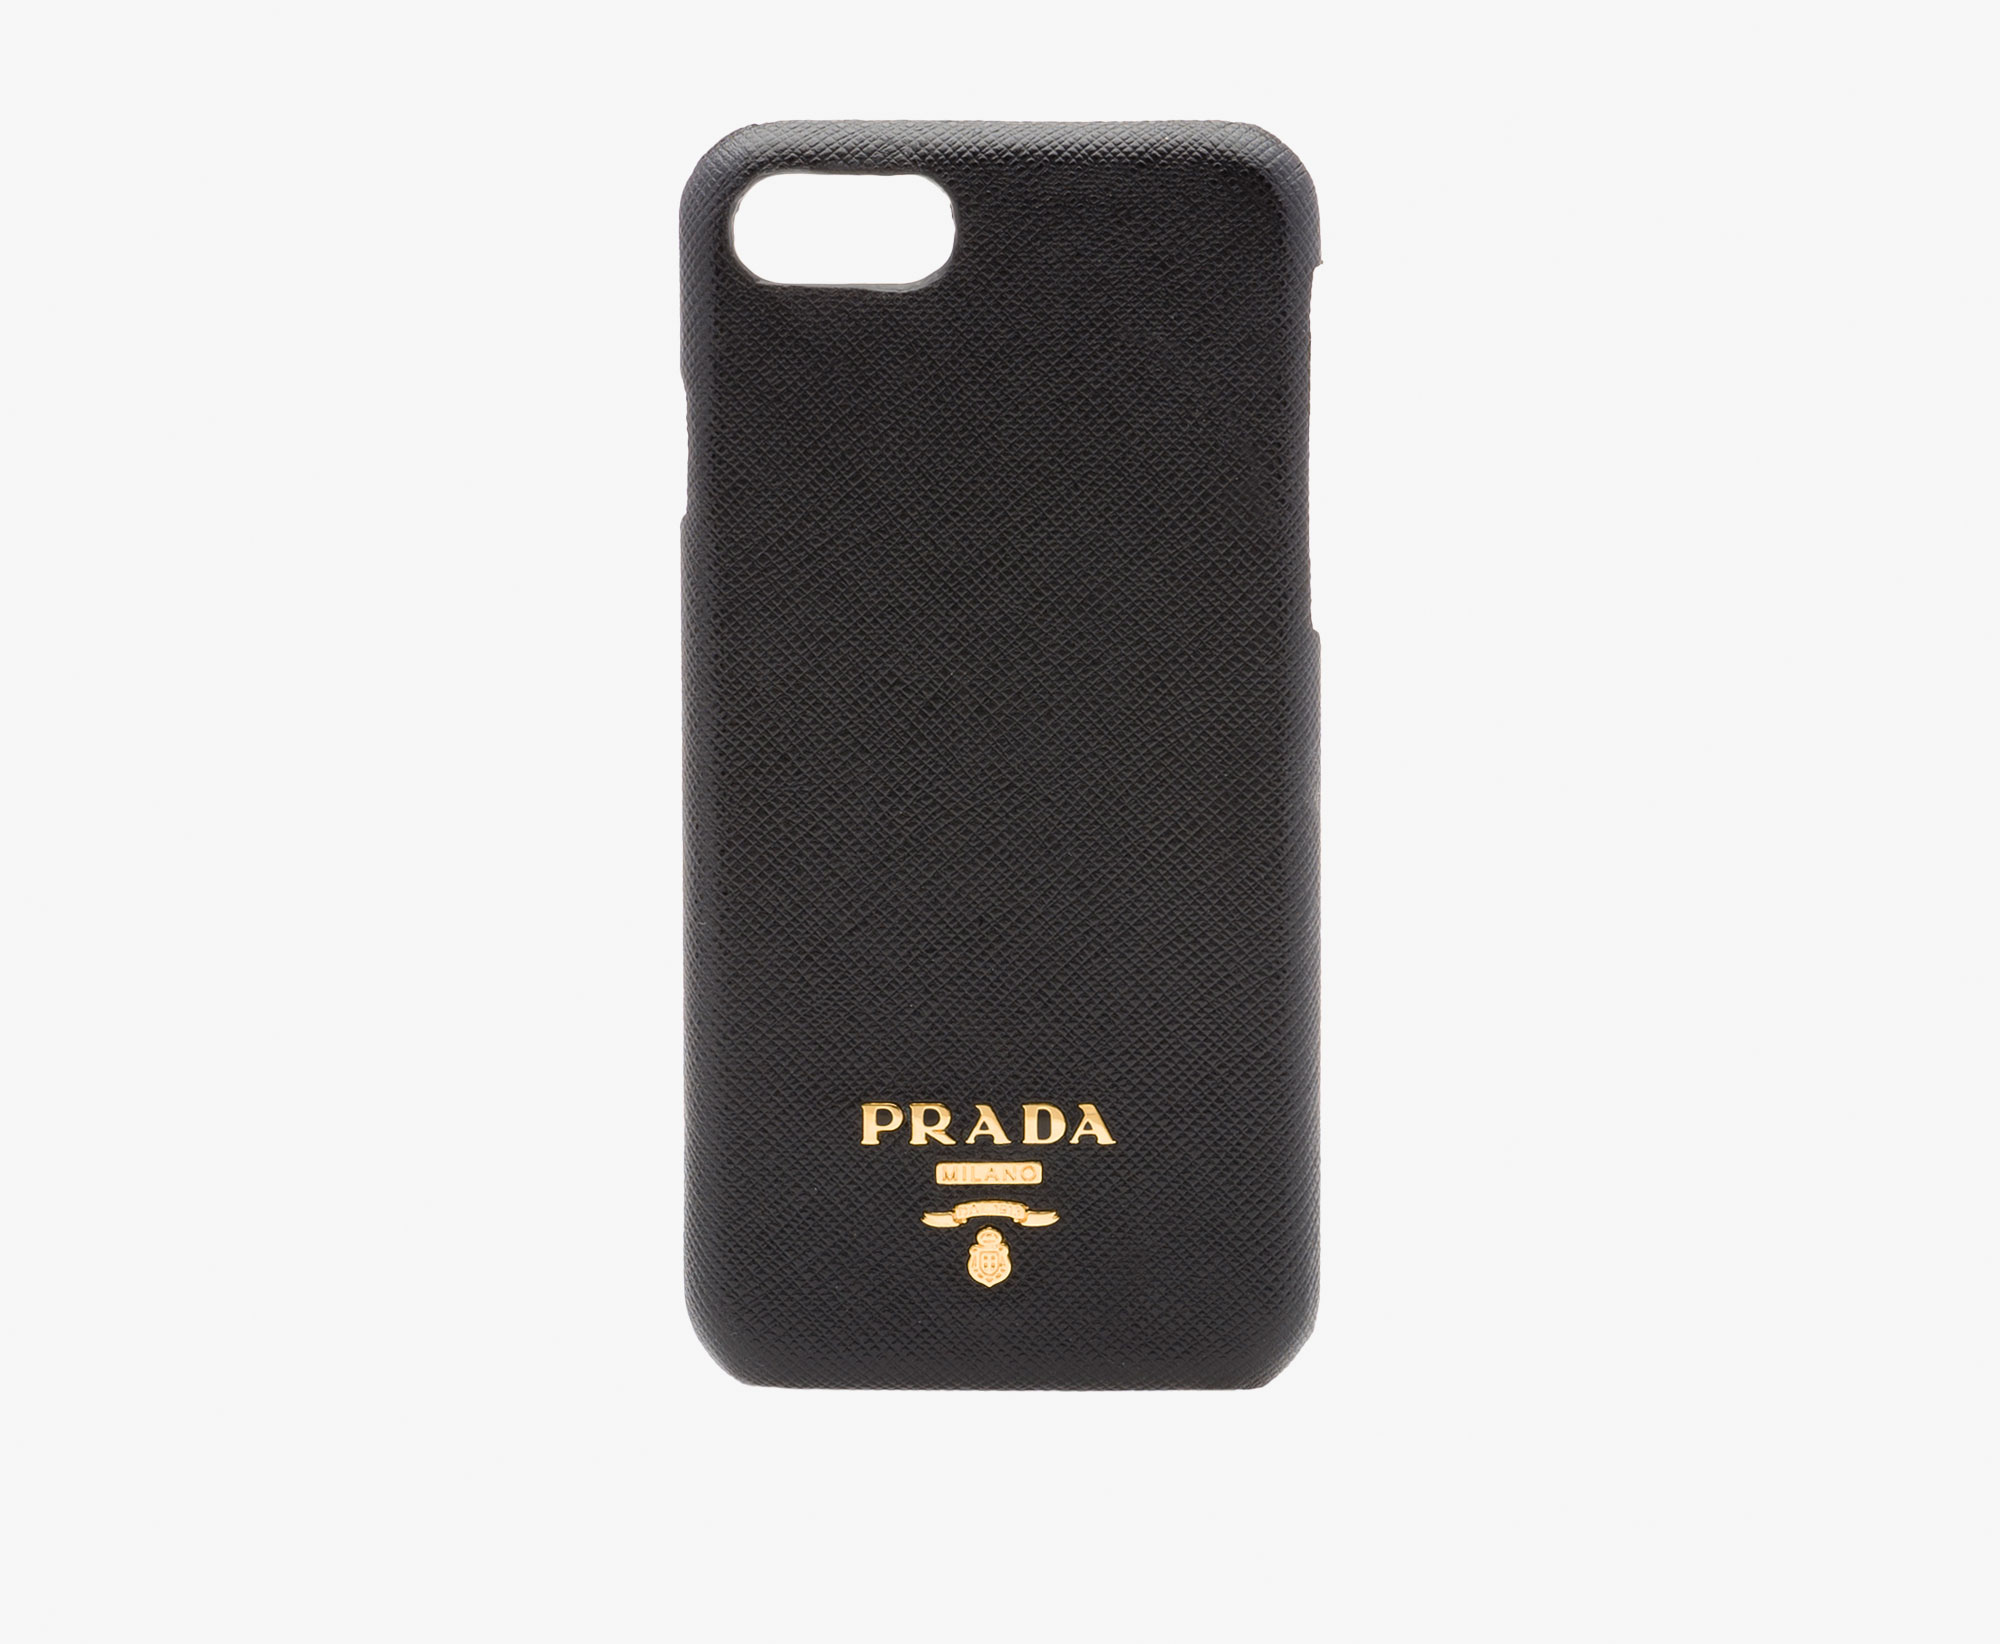 custodia iphone 7 prada